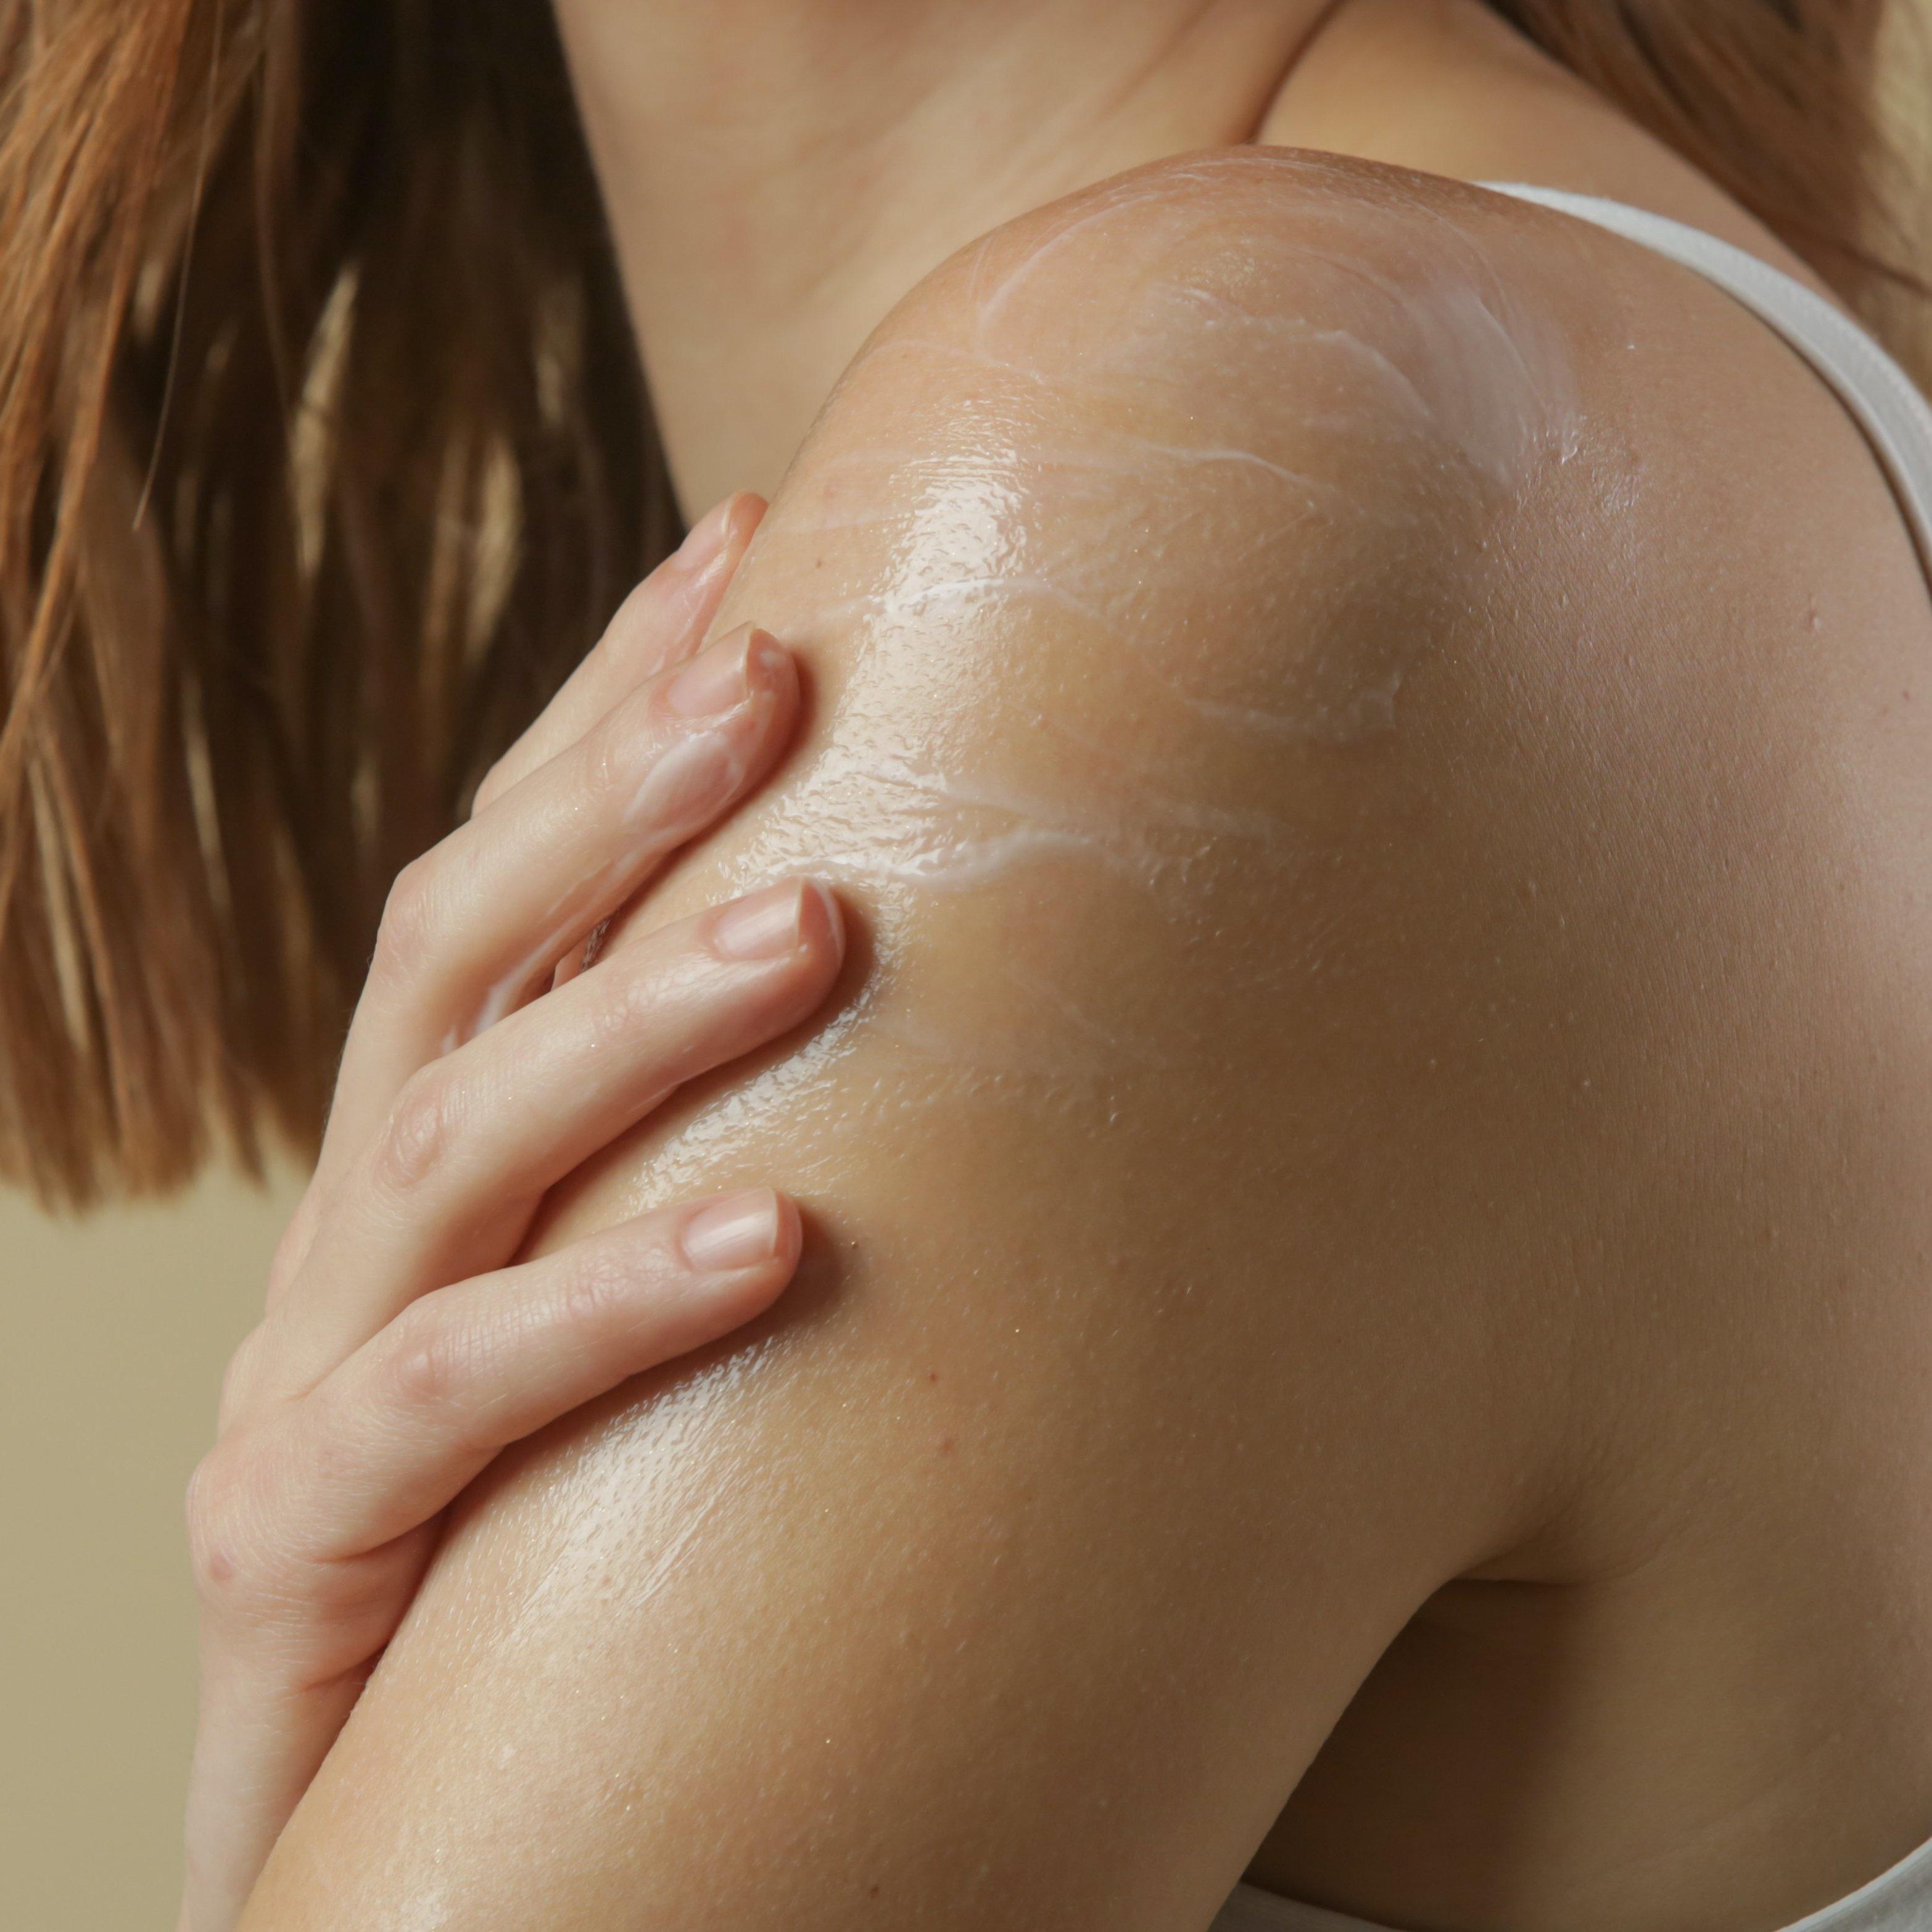 Dermactiva CBD Warming Muscle Cream Image 2